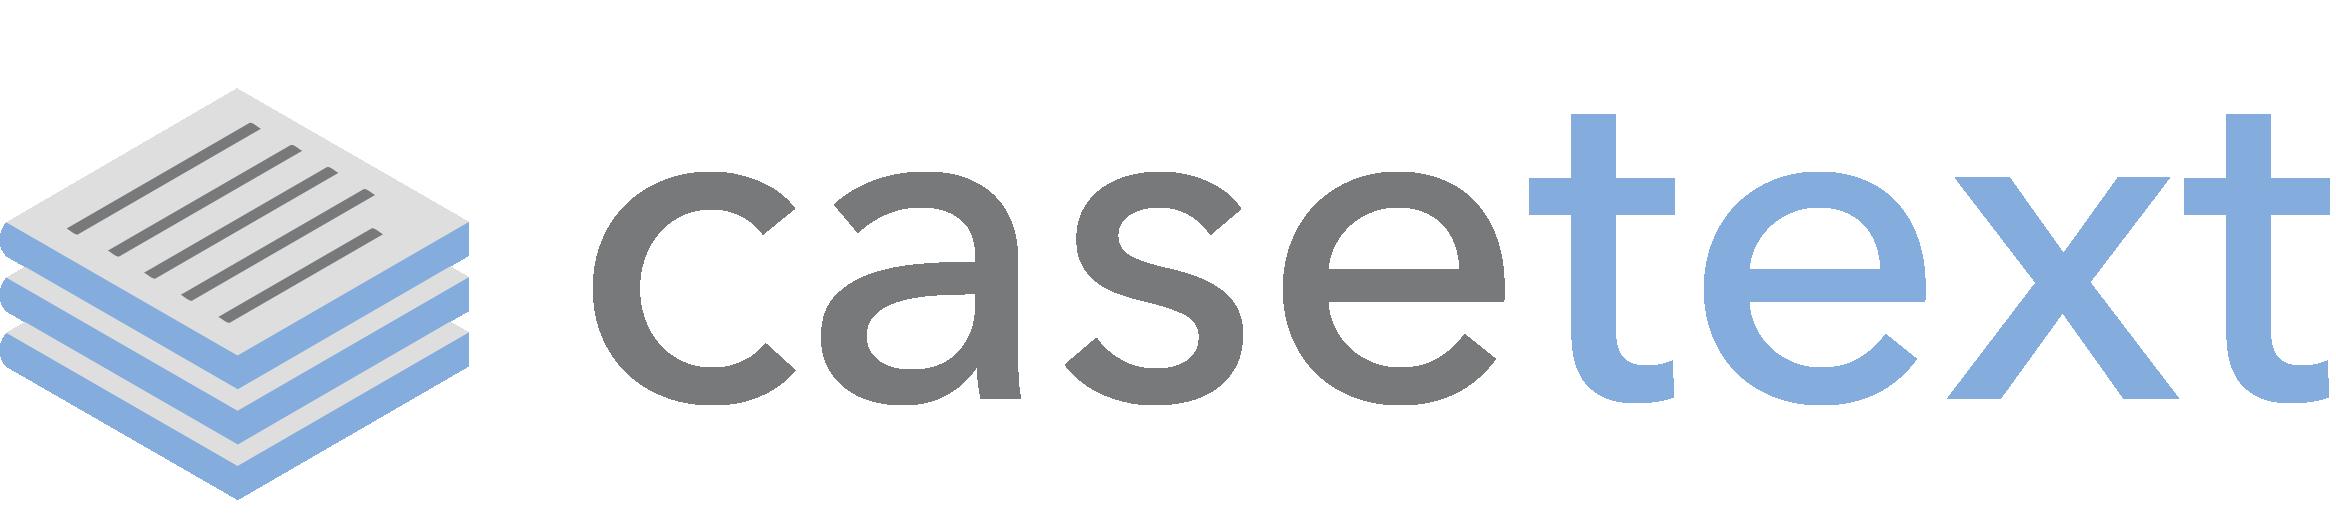 Casetext company logo